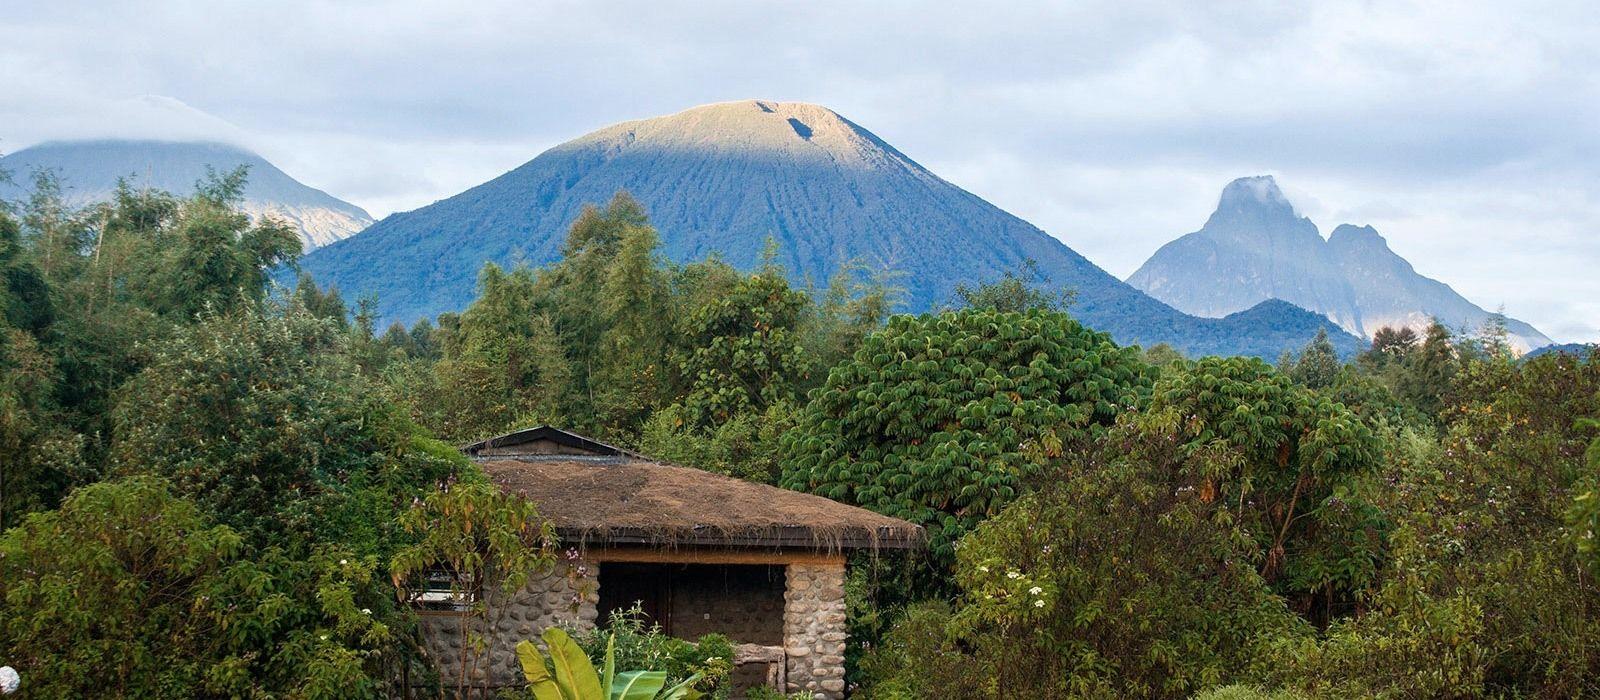 Kenia und Ruanda: Safari und Gorilla-Trekking Urlaub 4